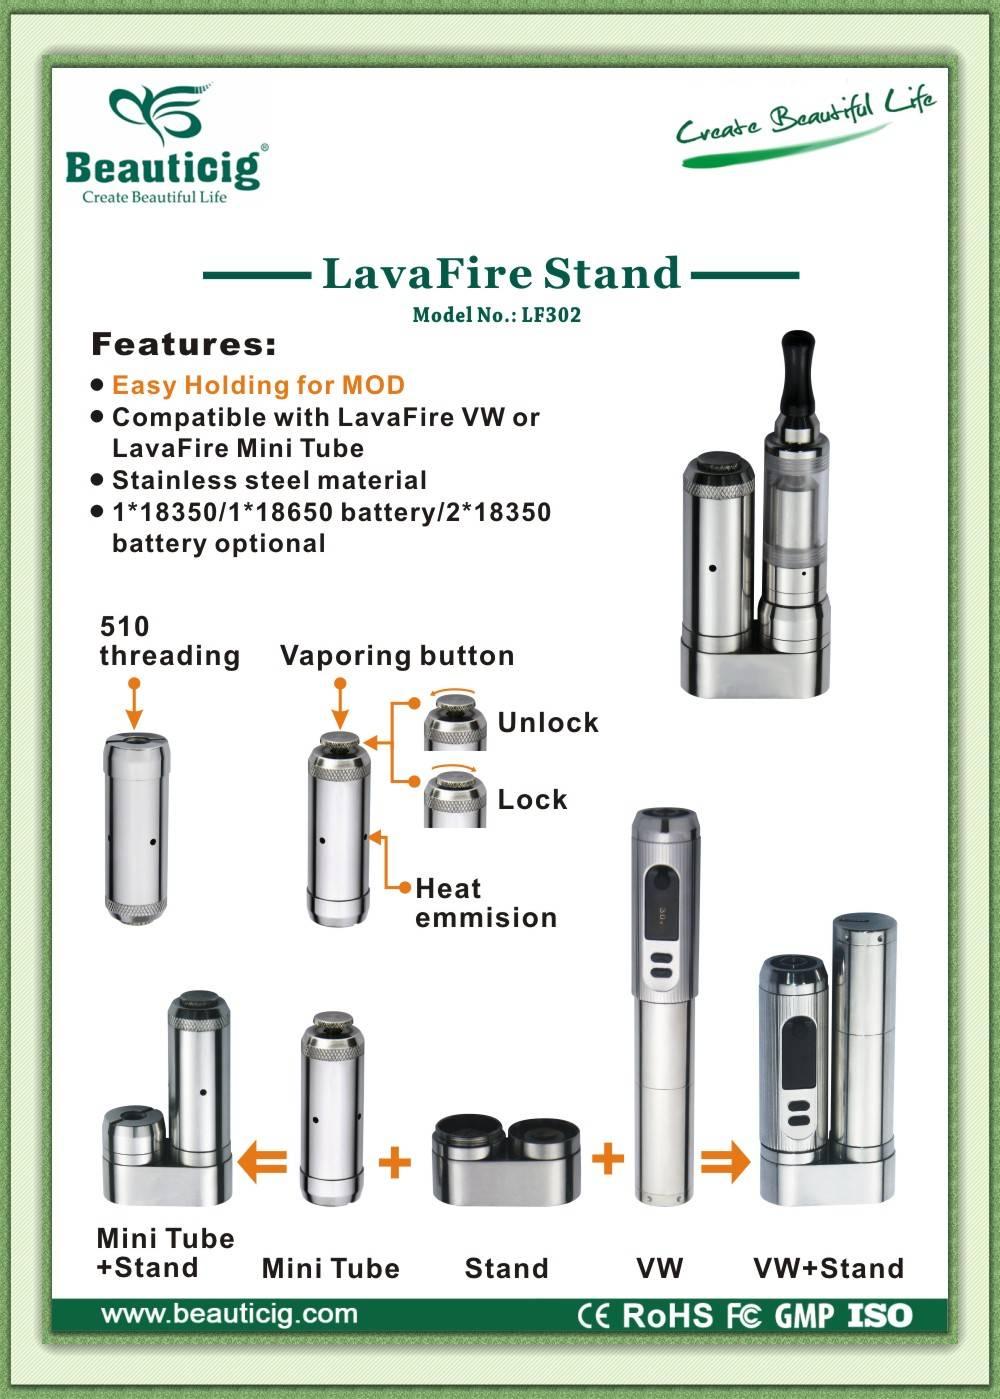 Lavafire stand